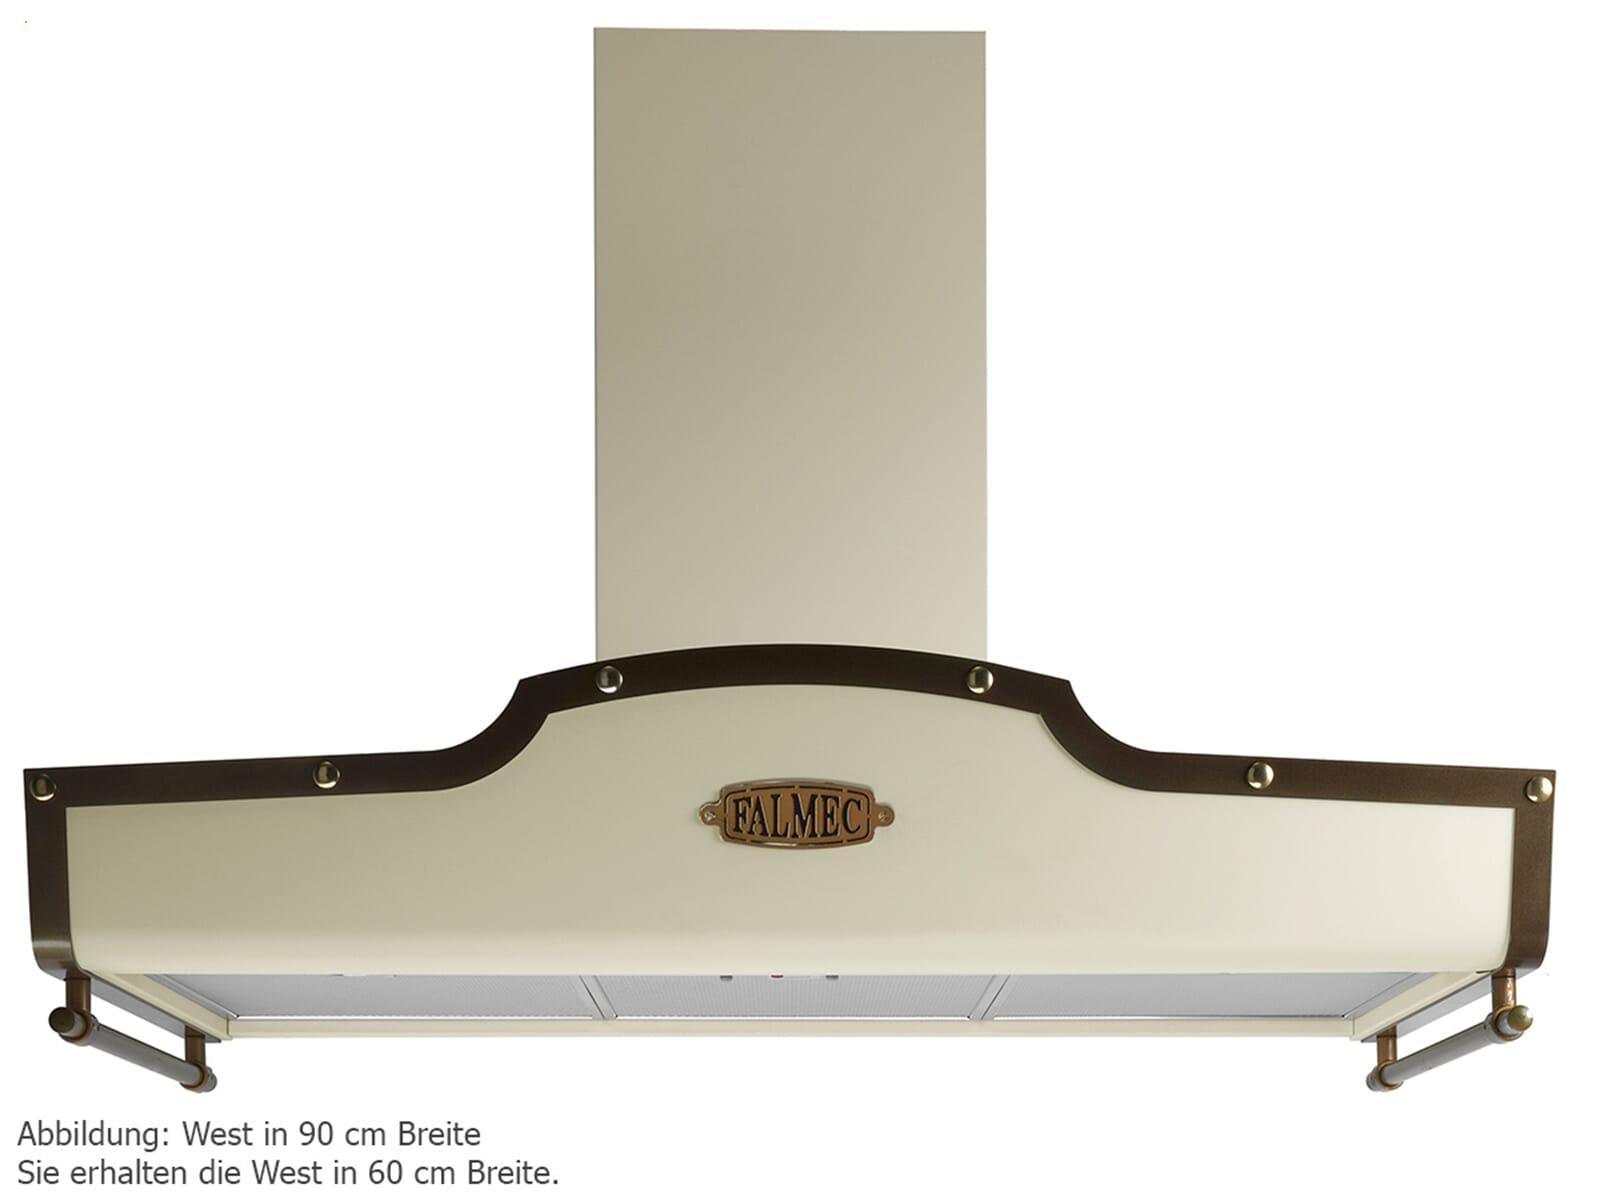 falmec west wand dunstabzugshaube elfenbein wandhaube. Black Bedroom Furniture Sets. Home Design Ideas